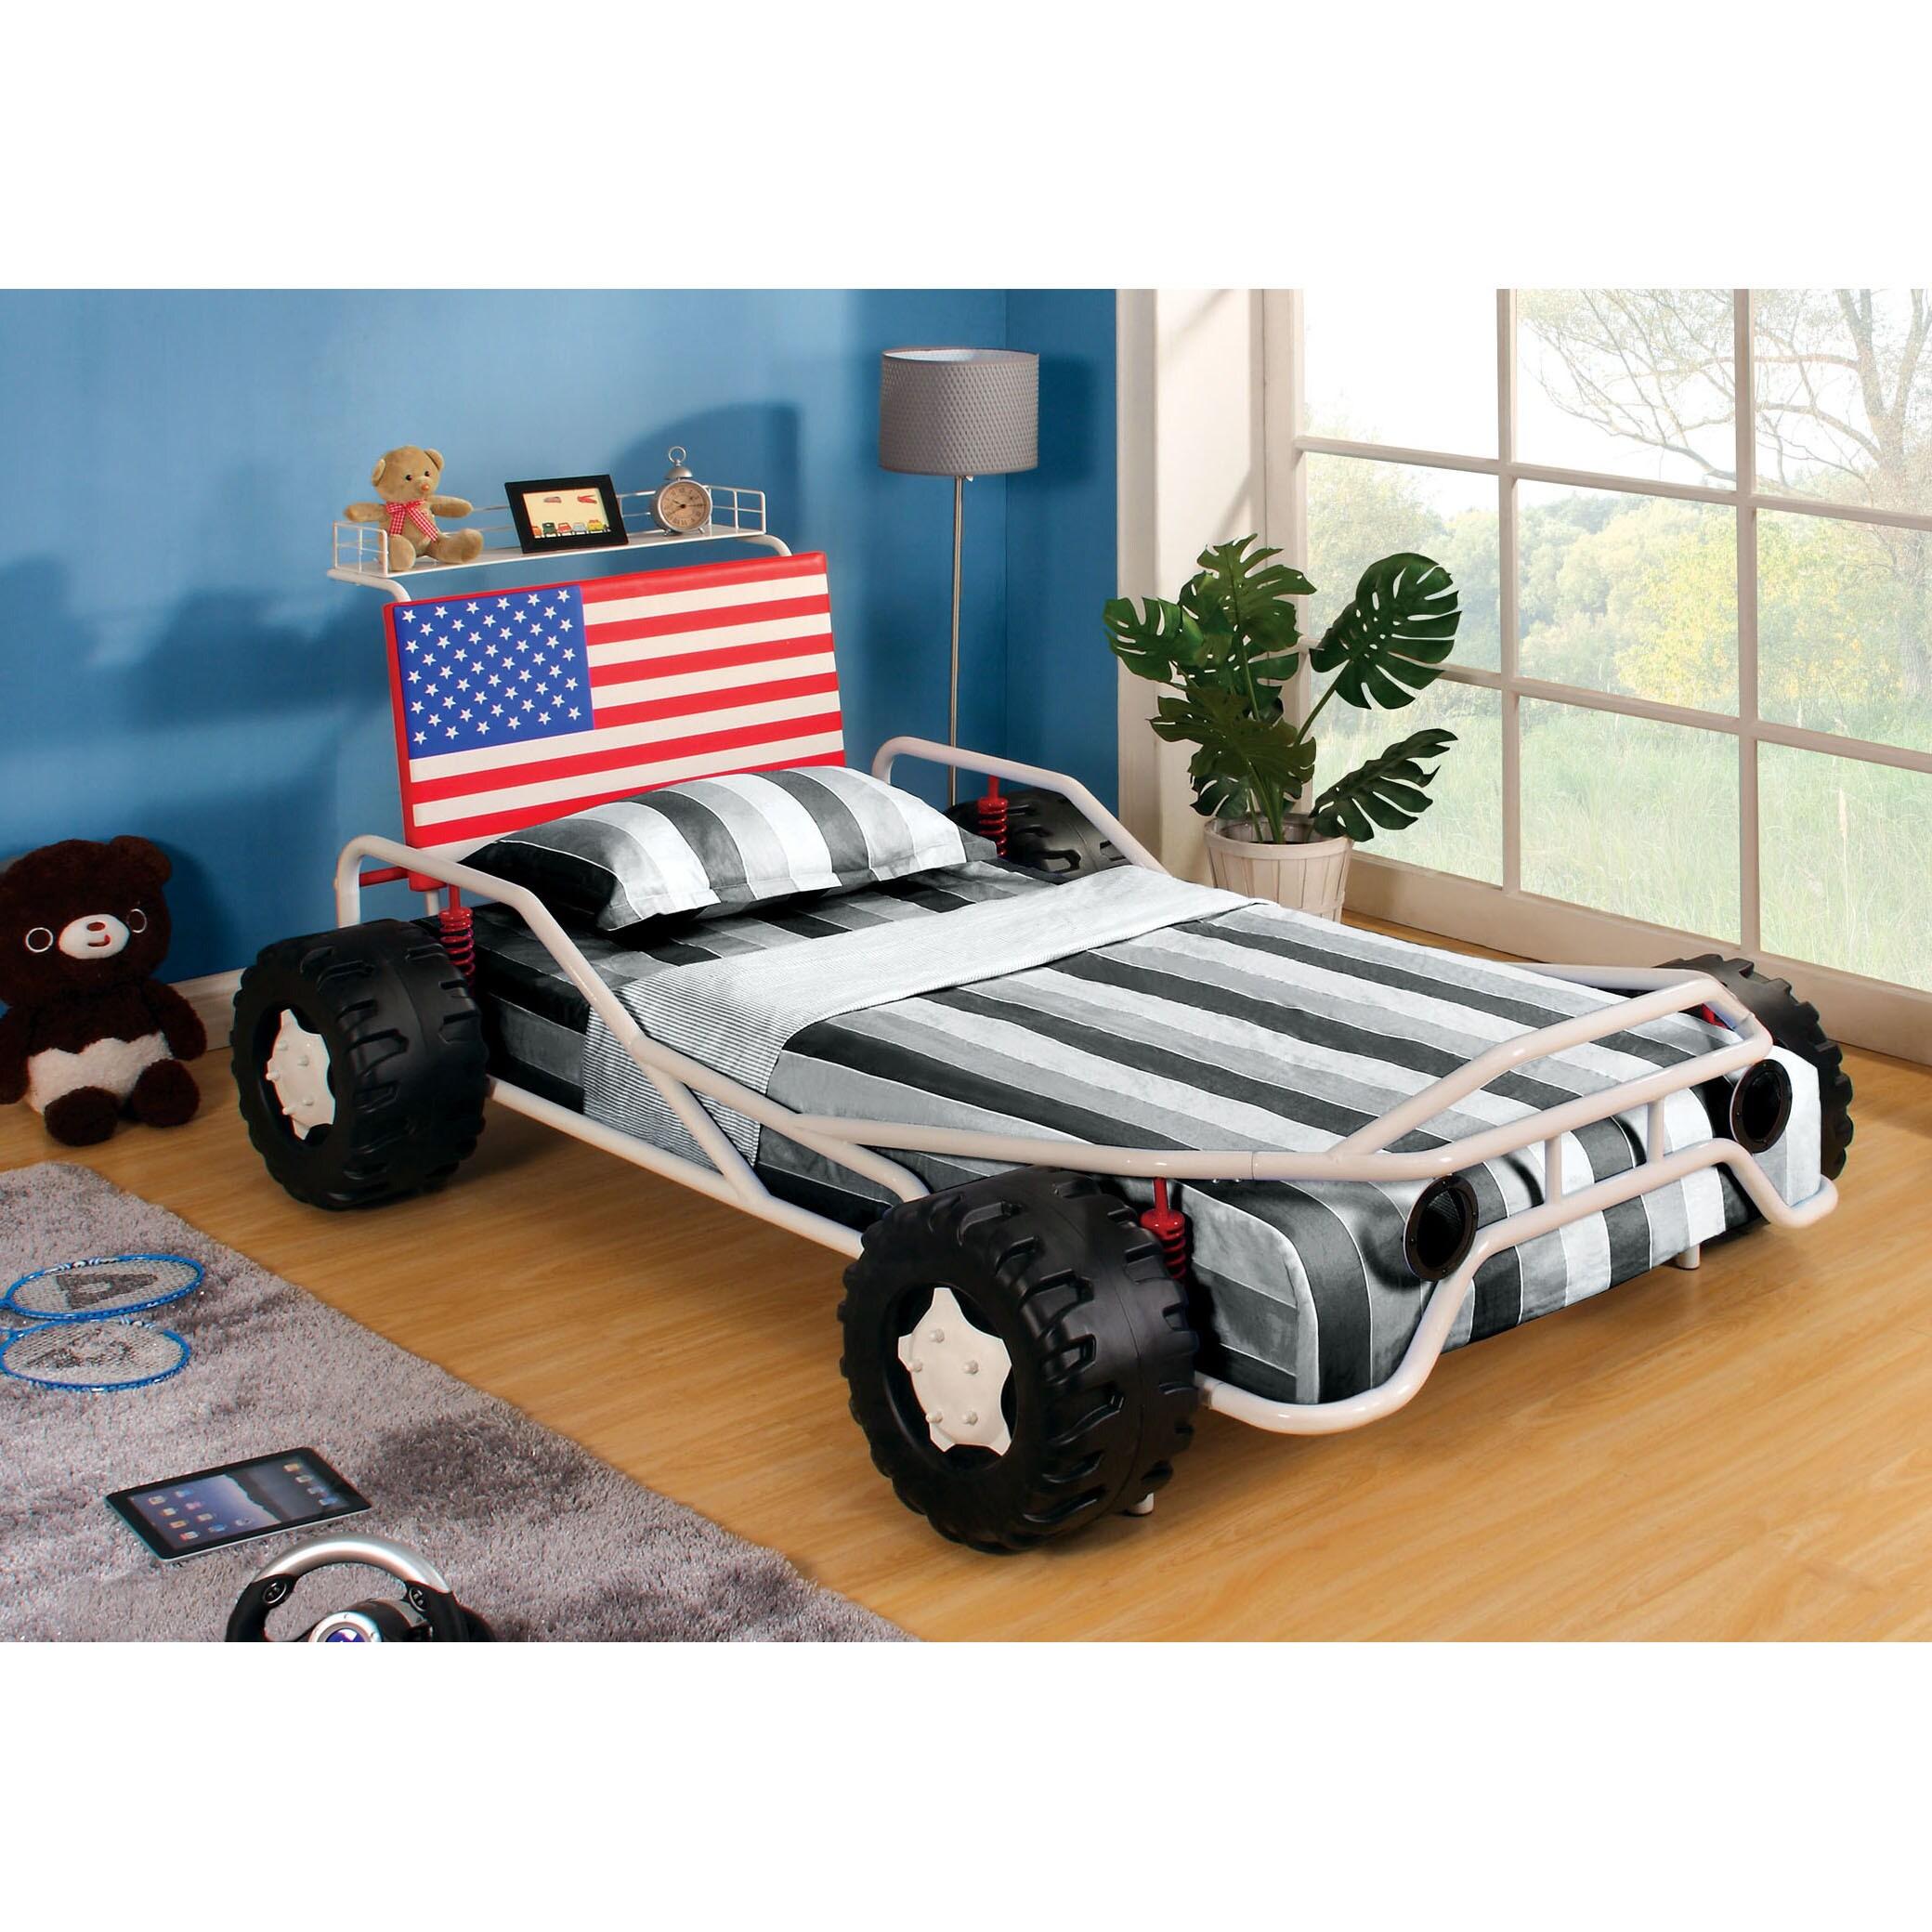 Furniture of america clint twin metal race car bed in red - Furniture Of America Patriot White Metal Race Car Youth B